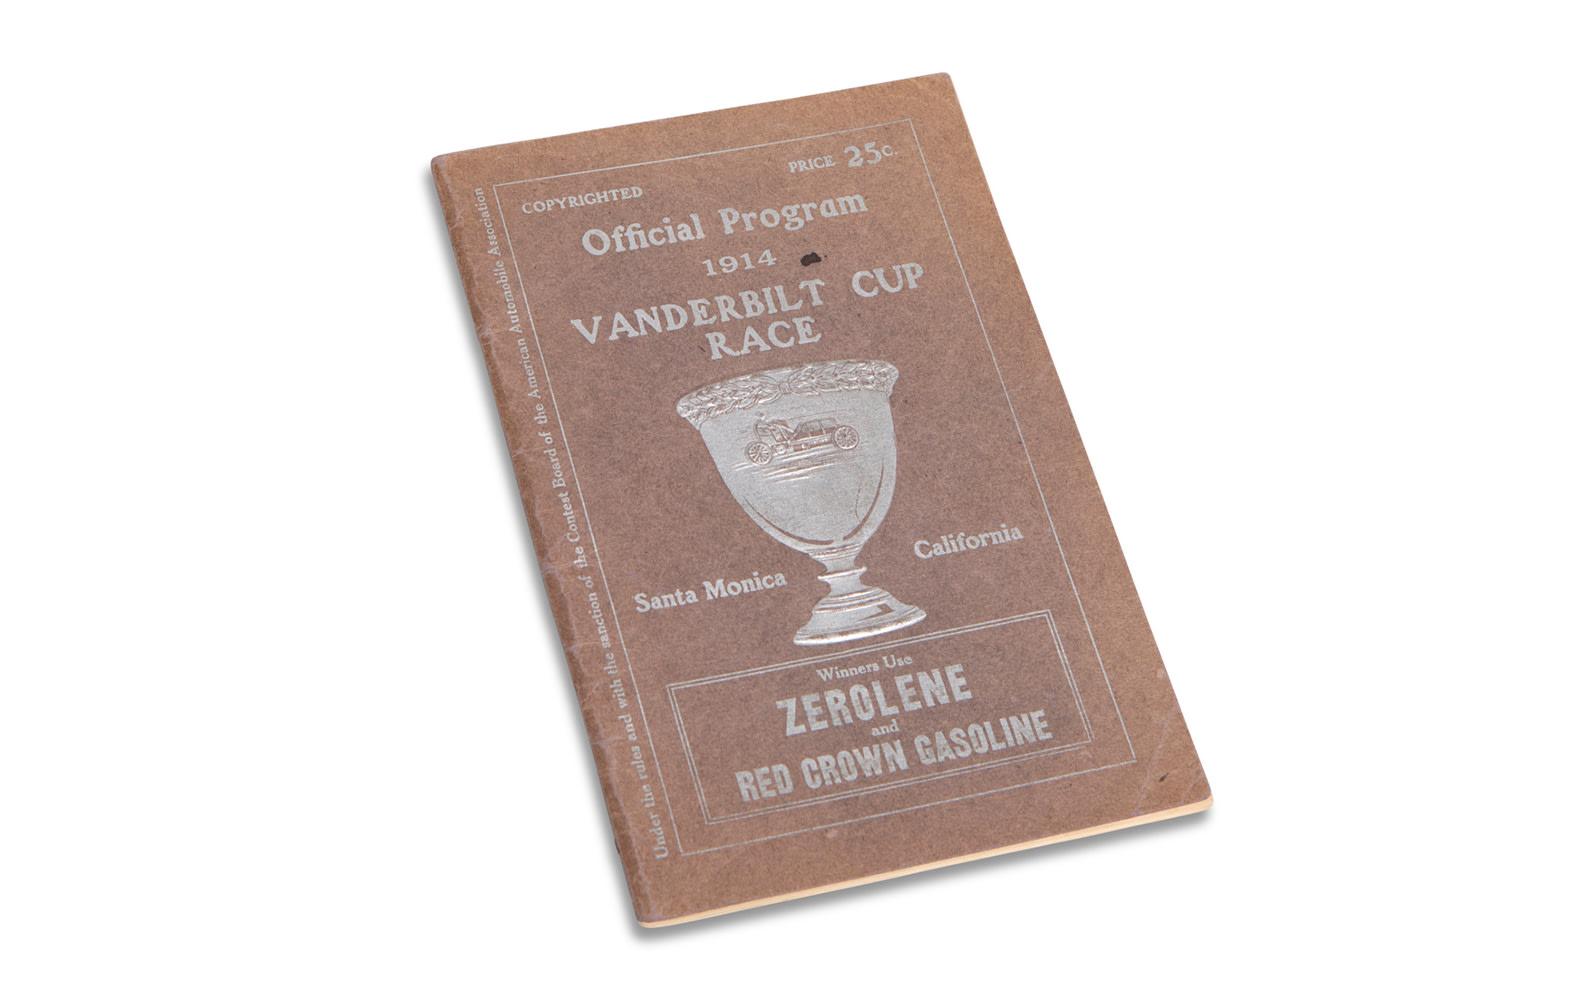 1914 Vanderbilt Cup Race Official Program